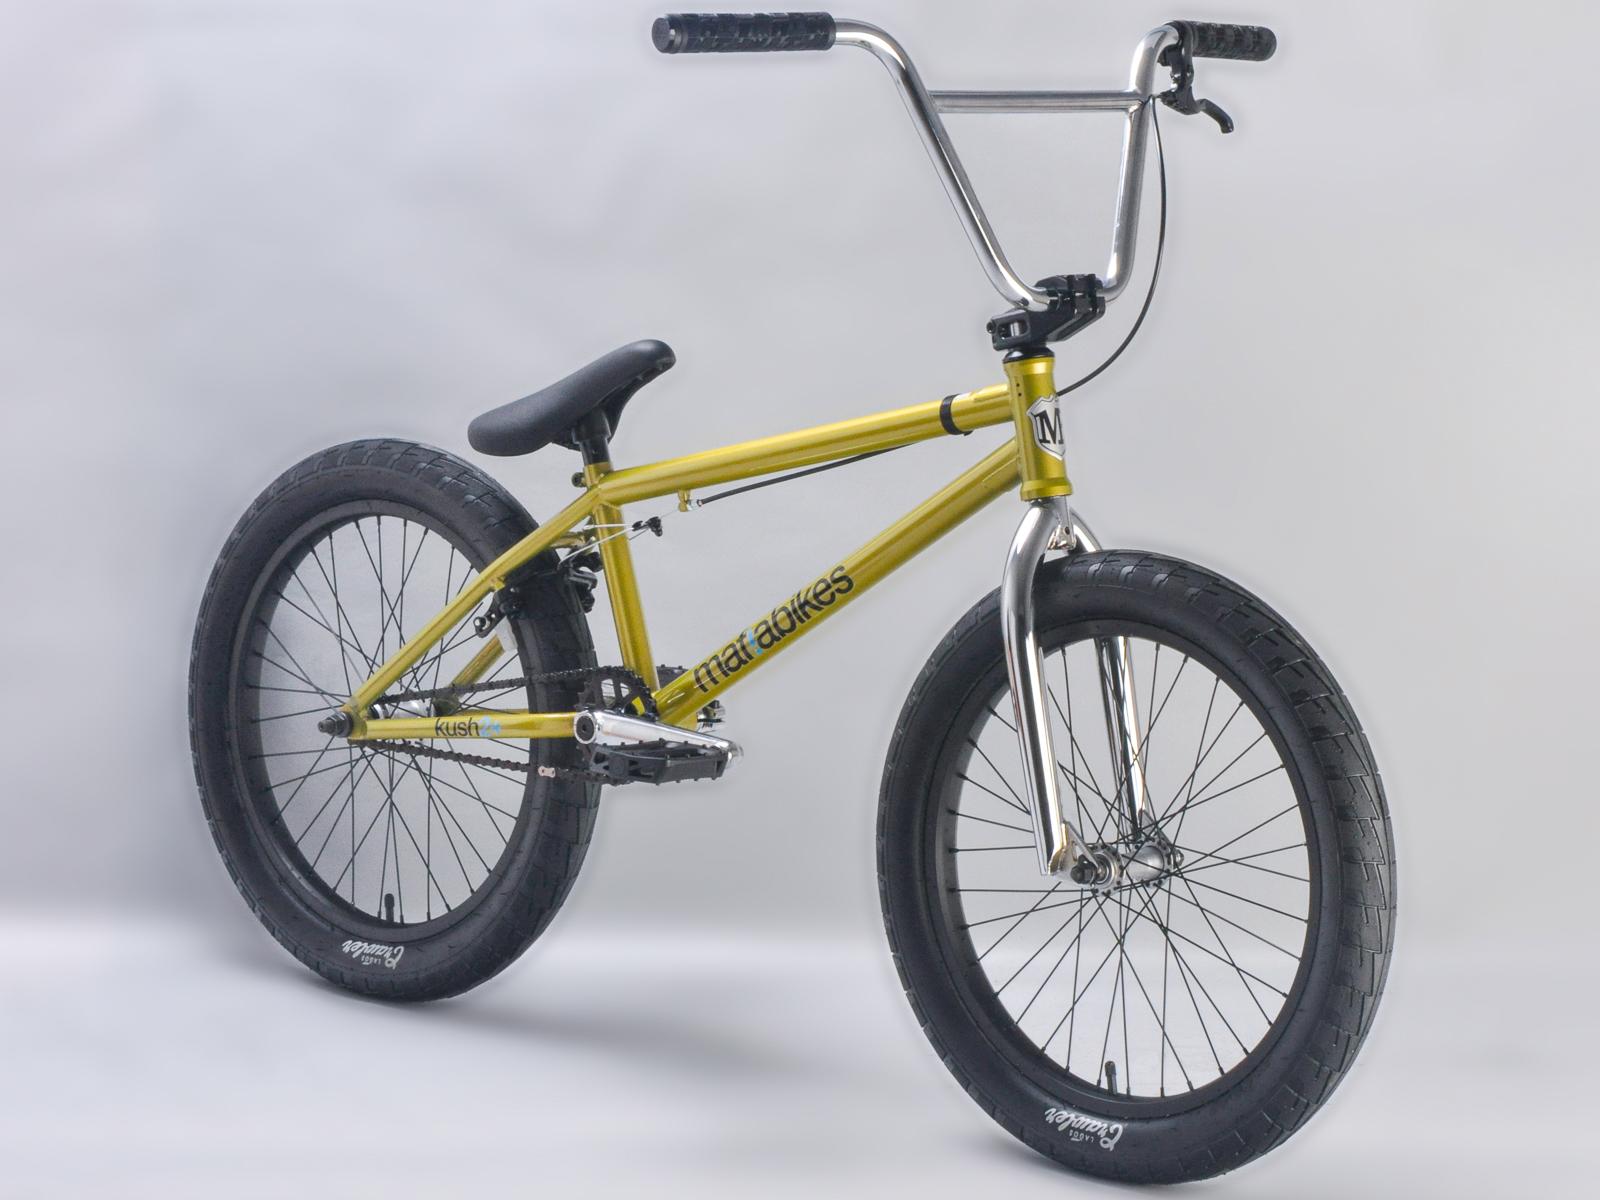 20 zoll mafiabikes bmx bike kush 2 verschiedene. Black Bedroom Furniture Sets. Home Design Ideas